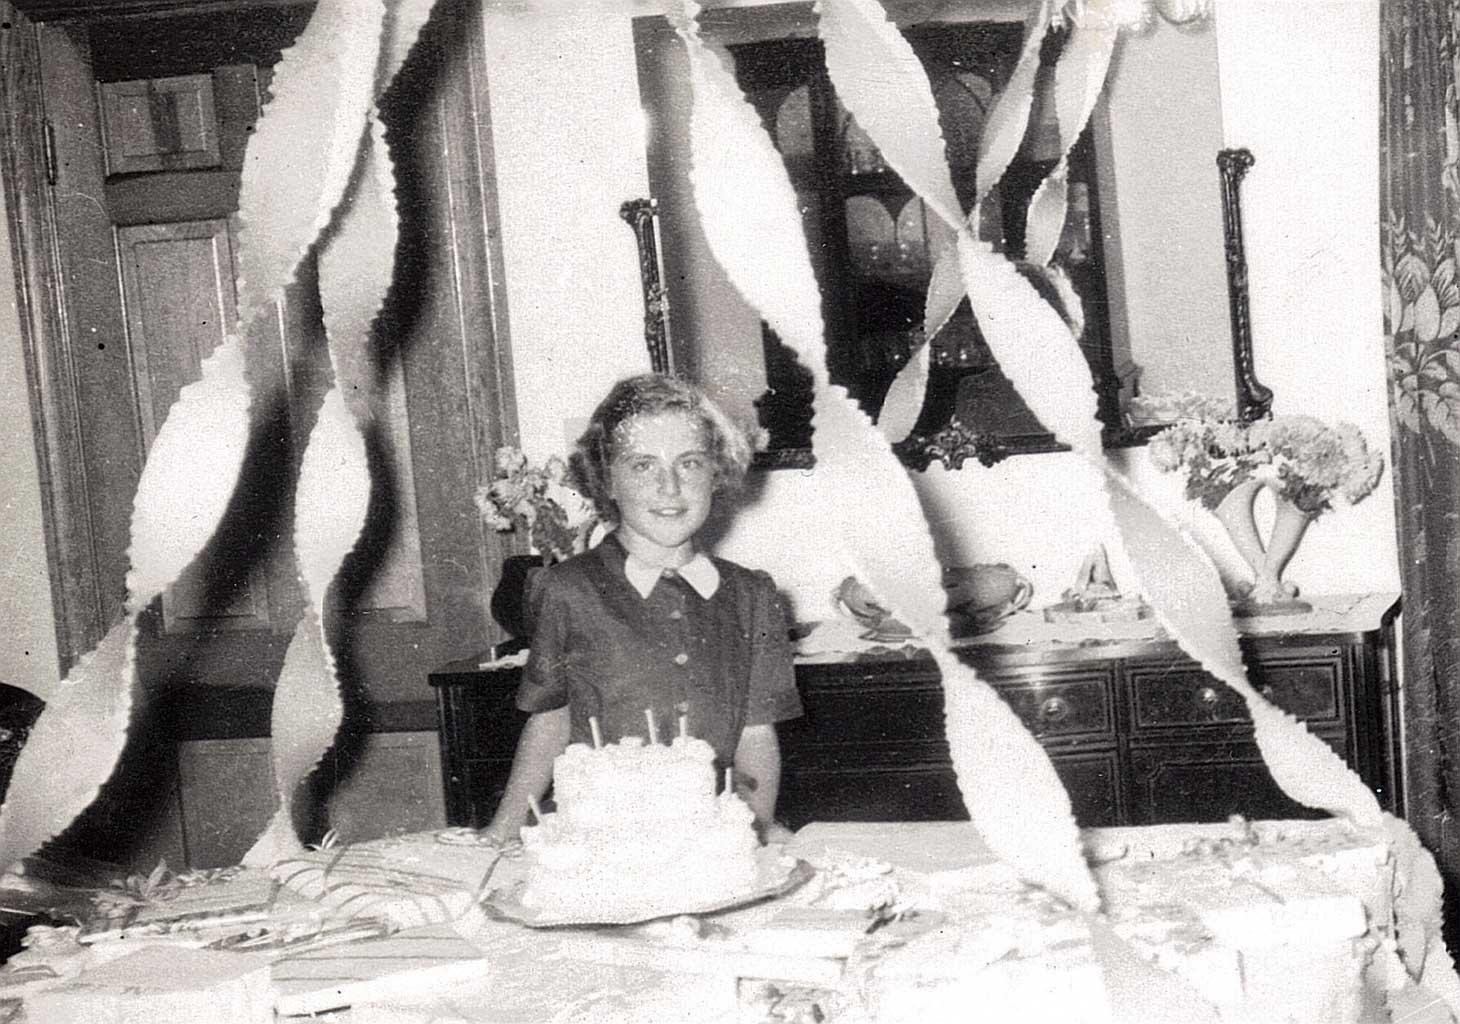 Janet and birthday cake